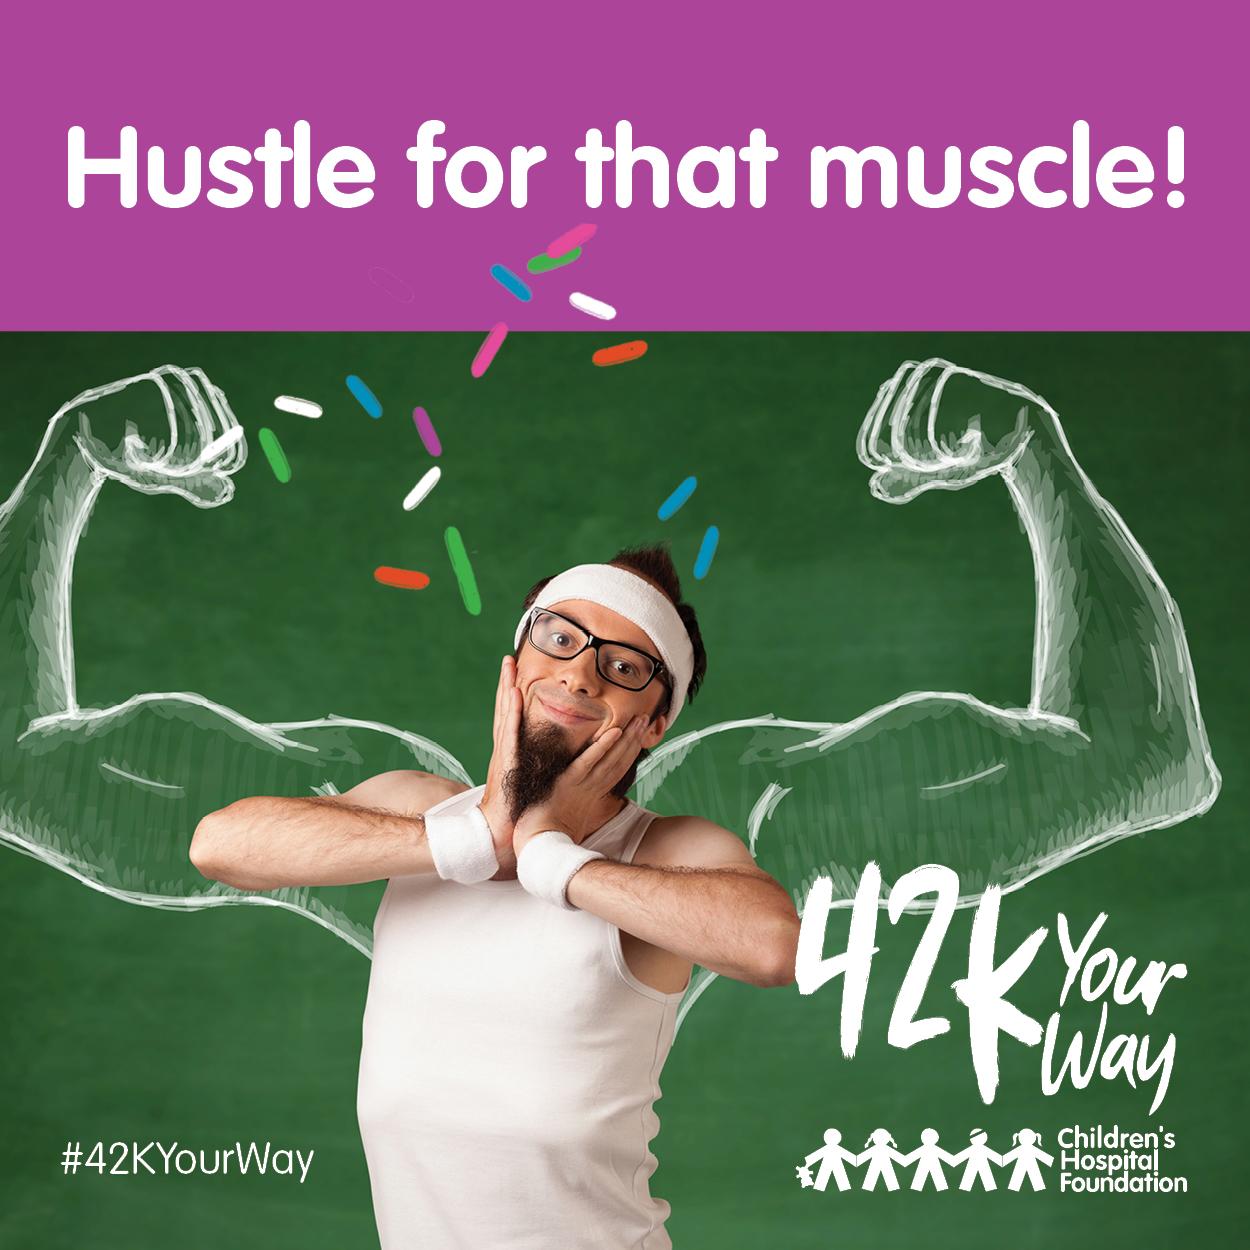 42k Your Way - Hustle